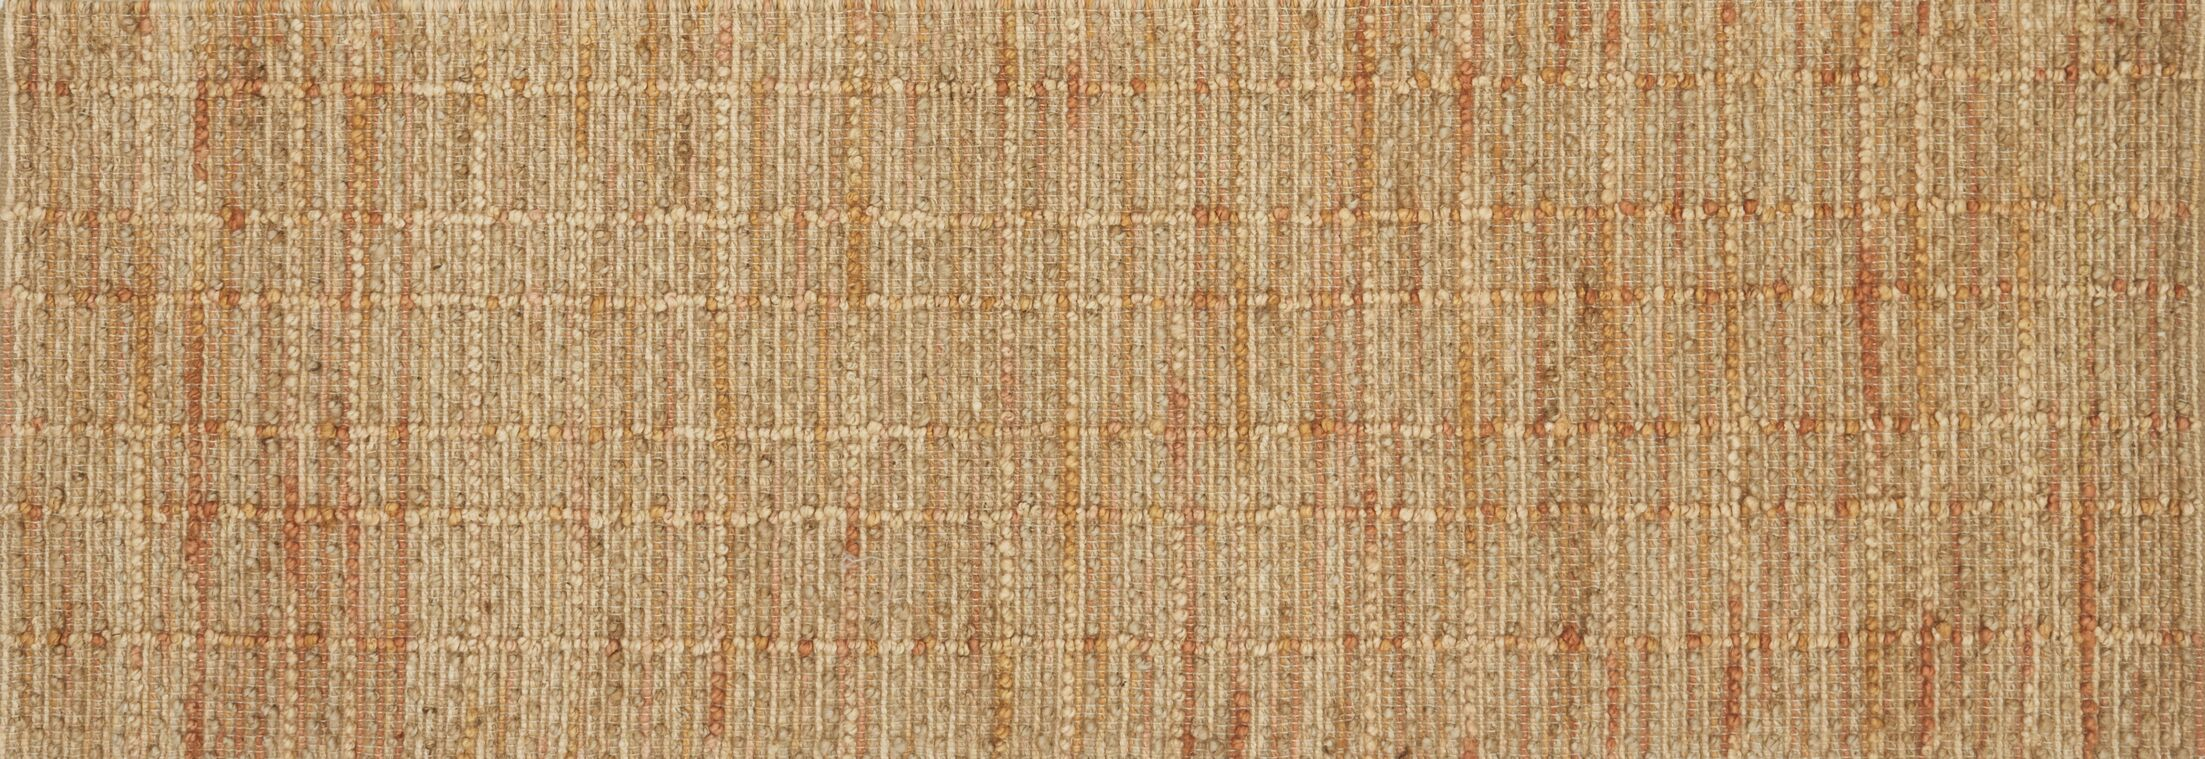 Pangkal Pinang Hand-Woven Tangerine Area Rug Rug Size: Runner 2'6